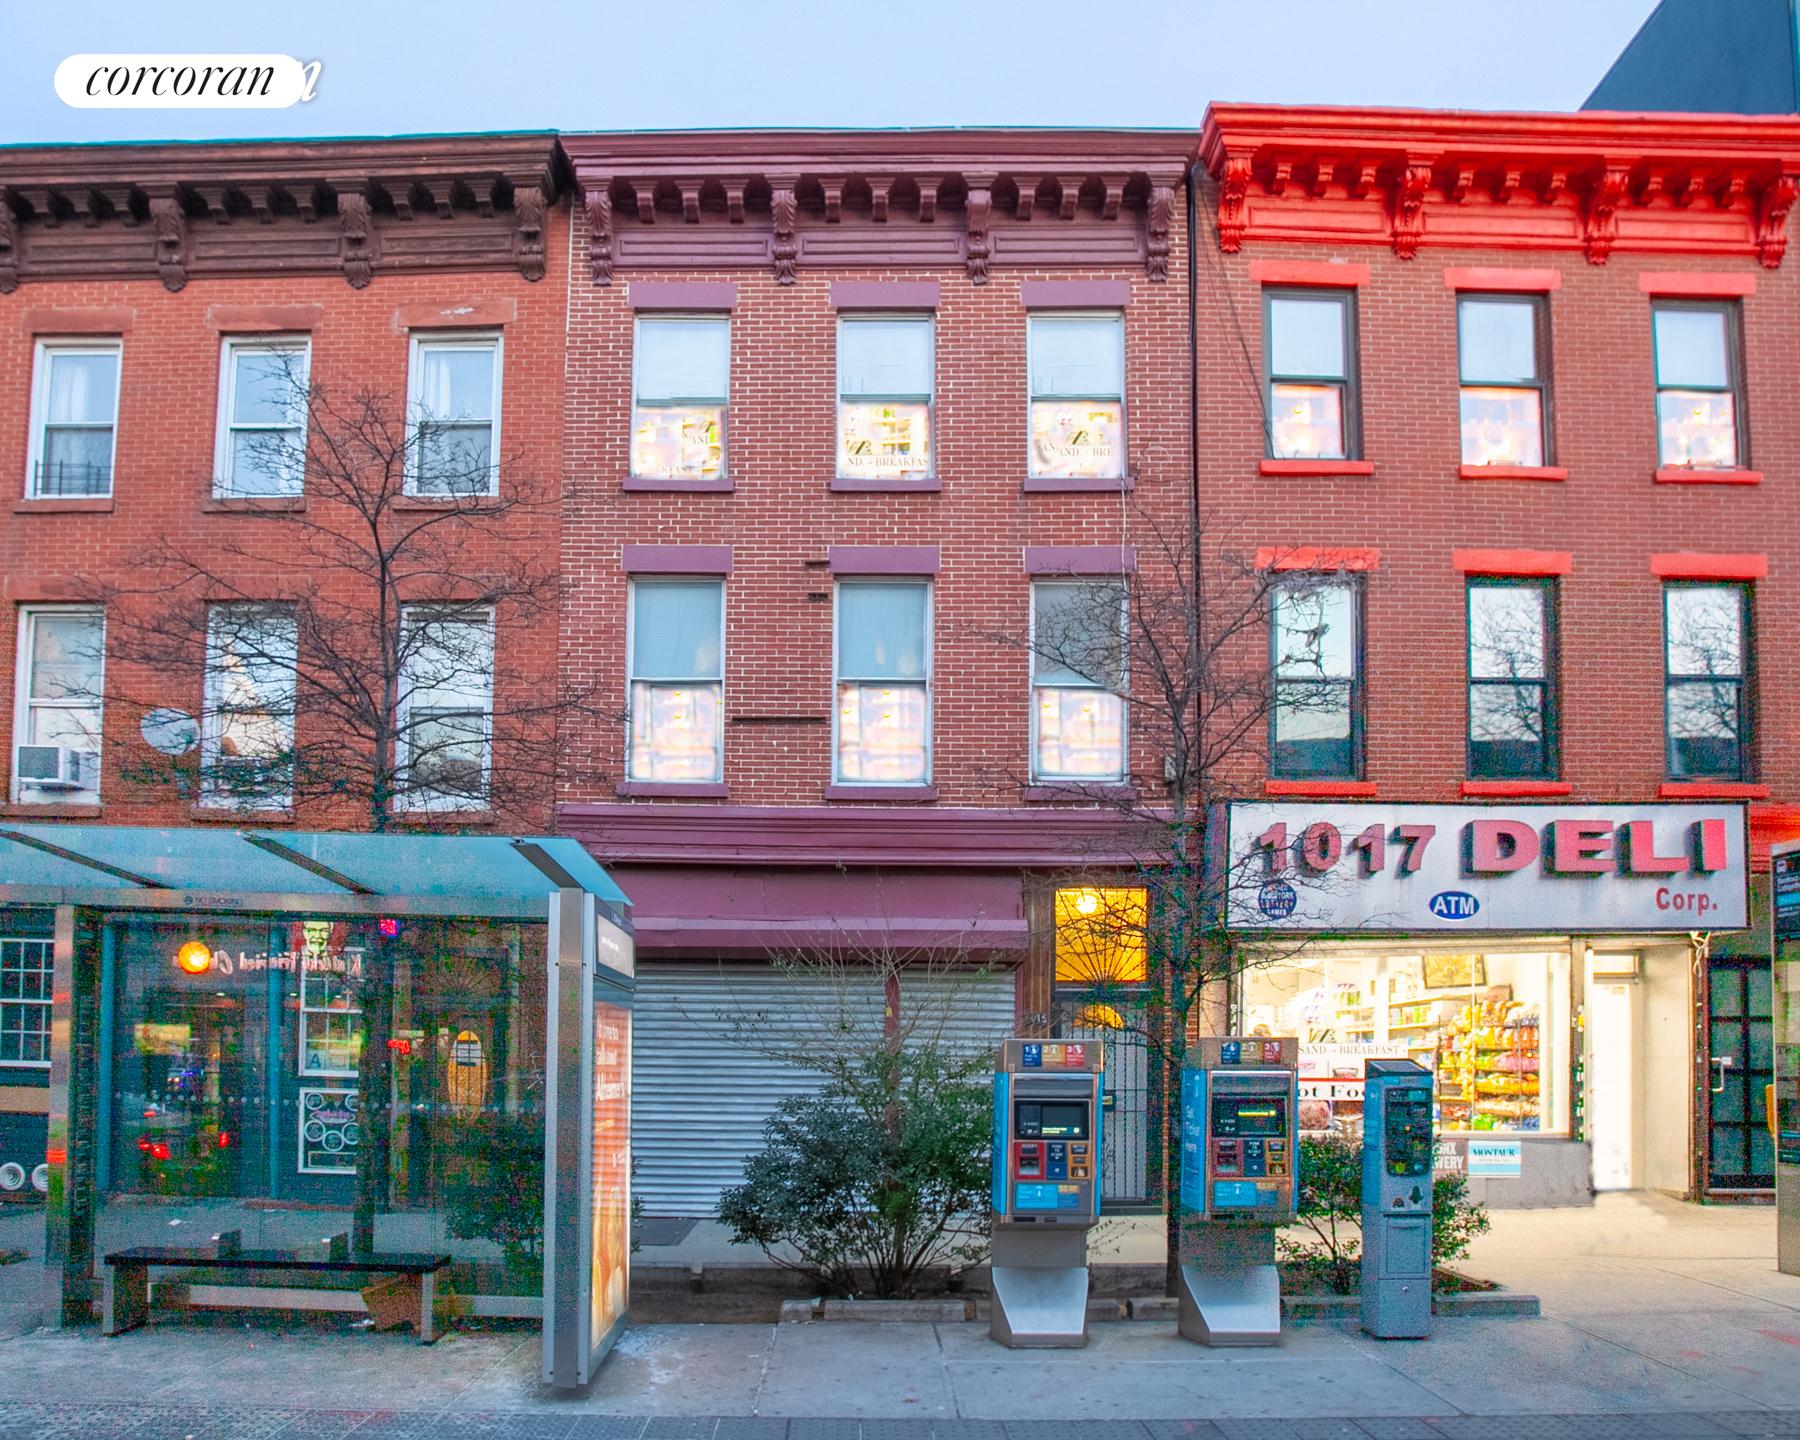 1015 Bedford Avenue Bedford Stuyvesant Brooklyn NY 11205